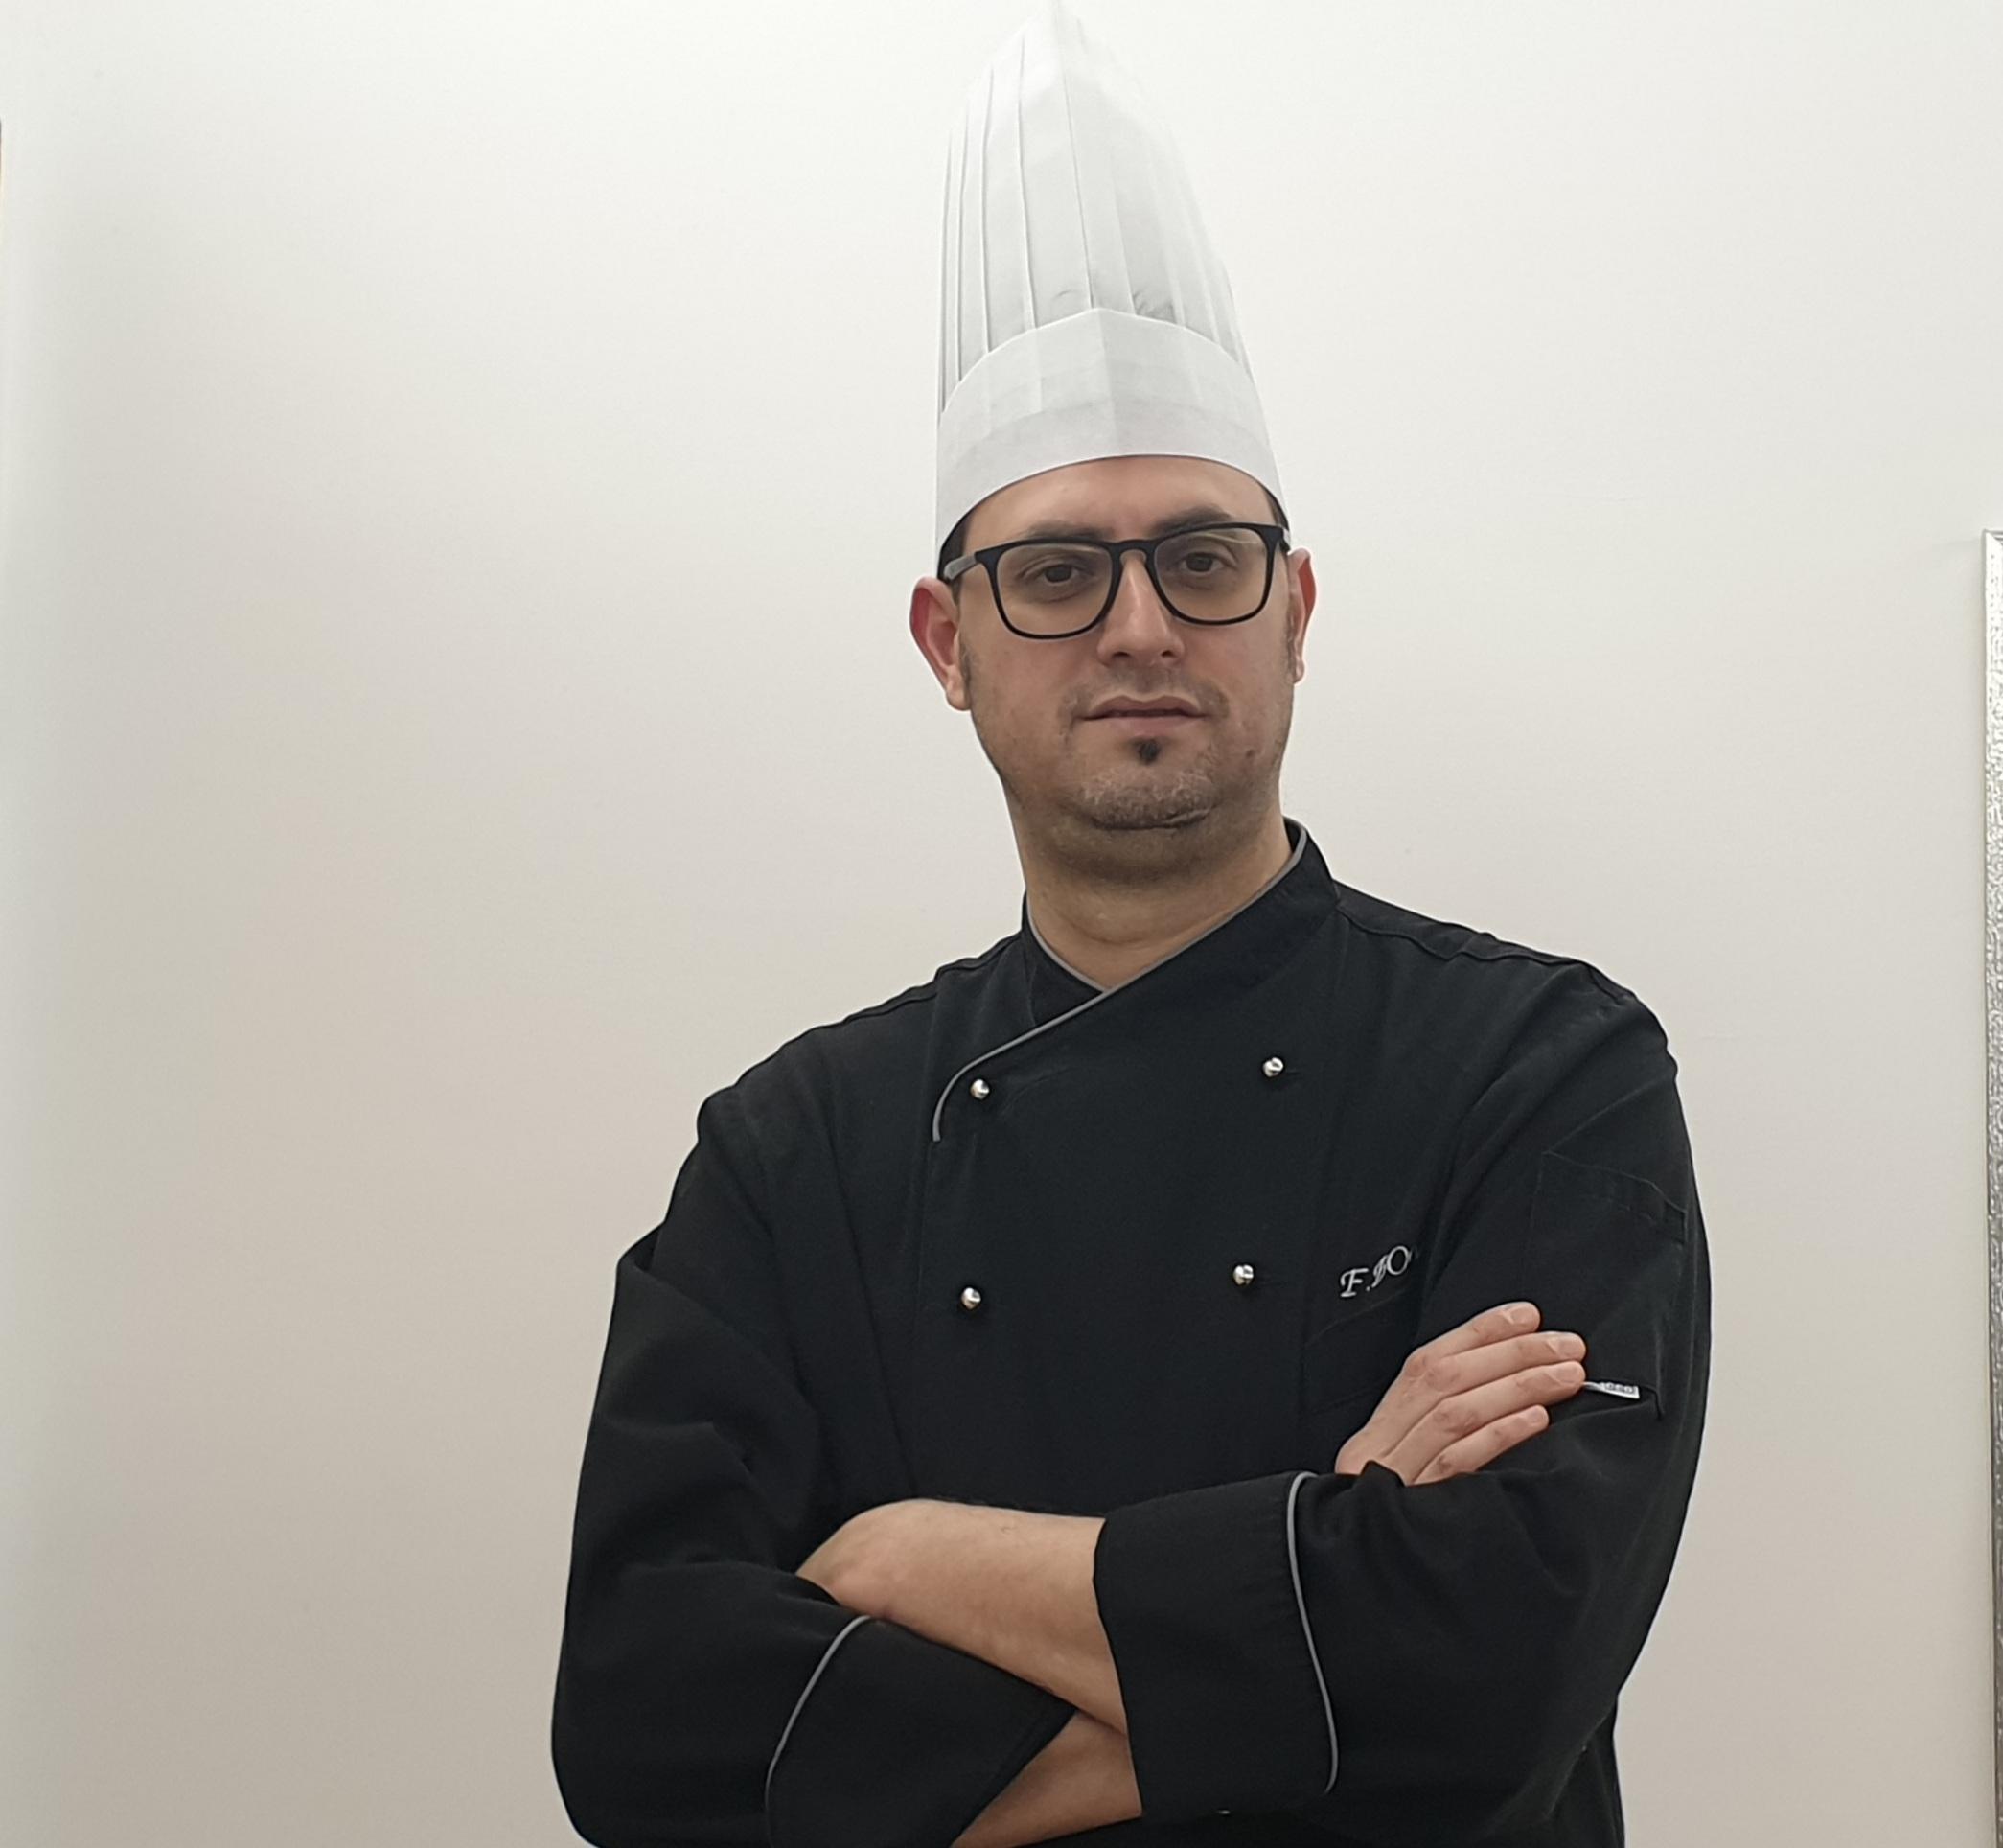 Francesco Bonomo